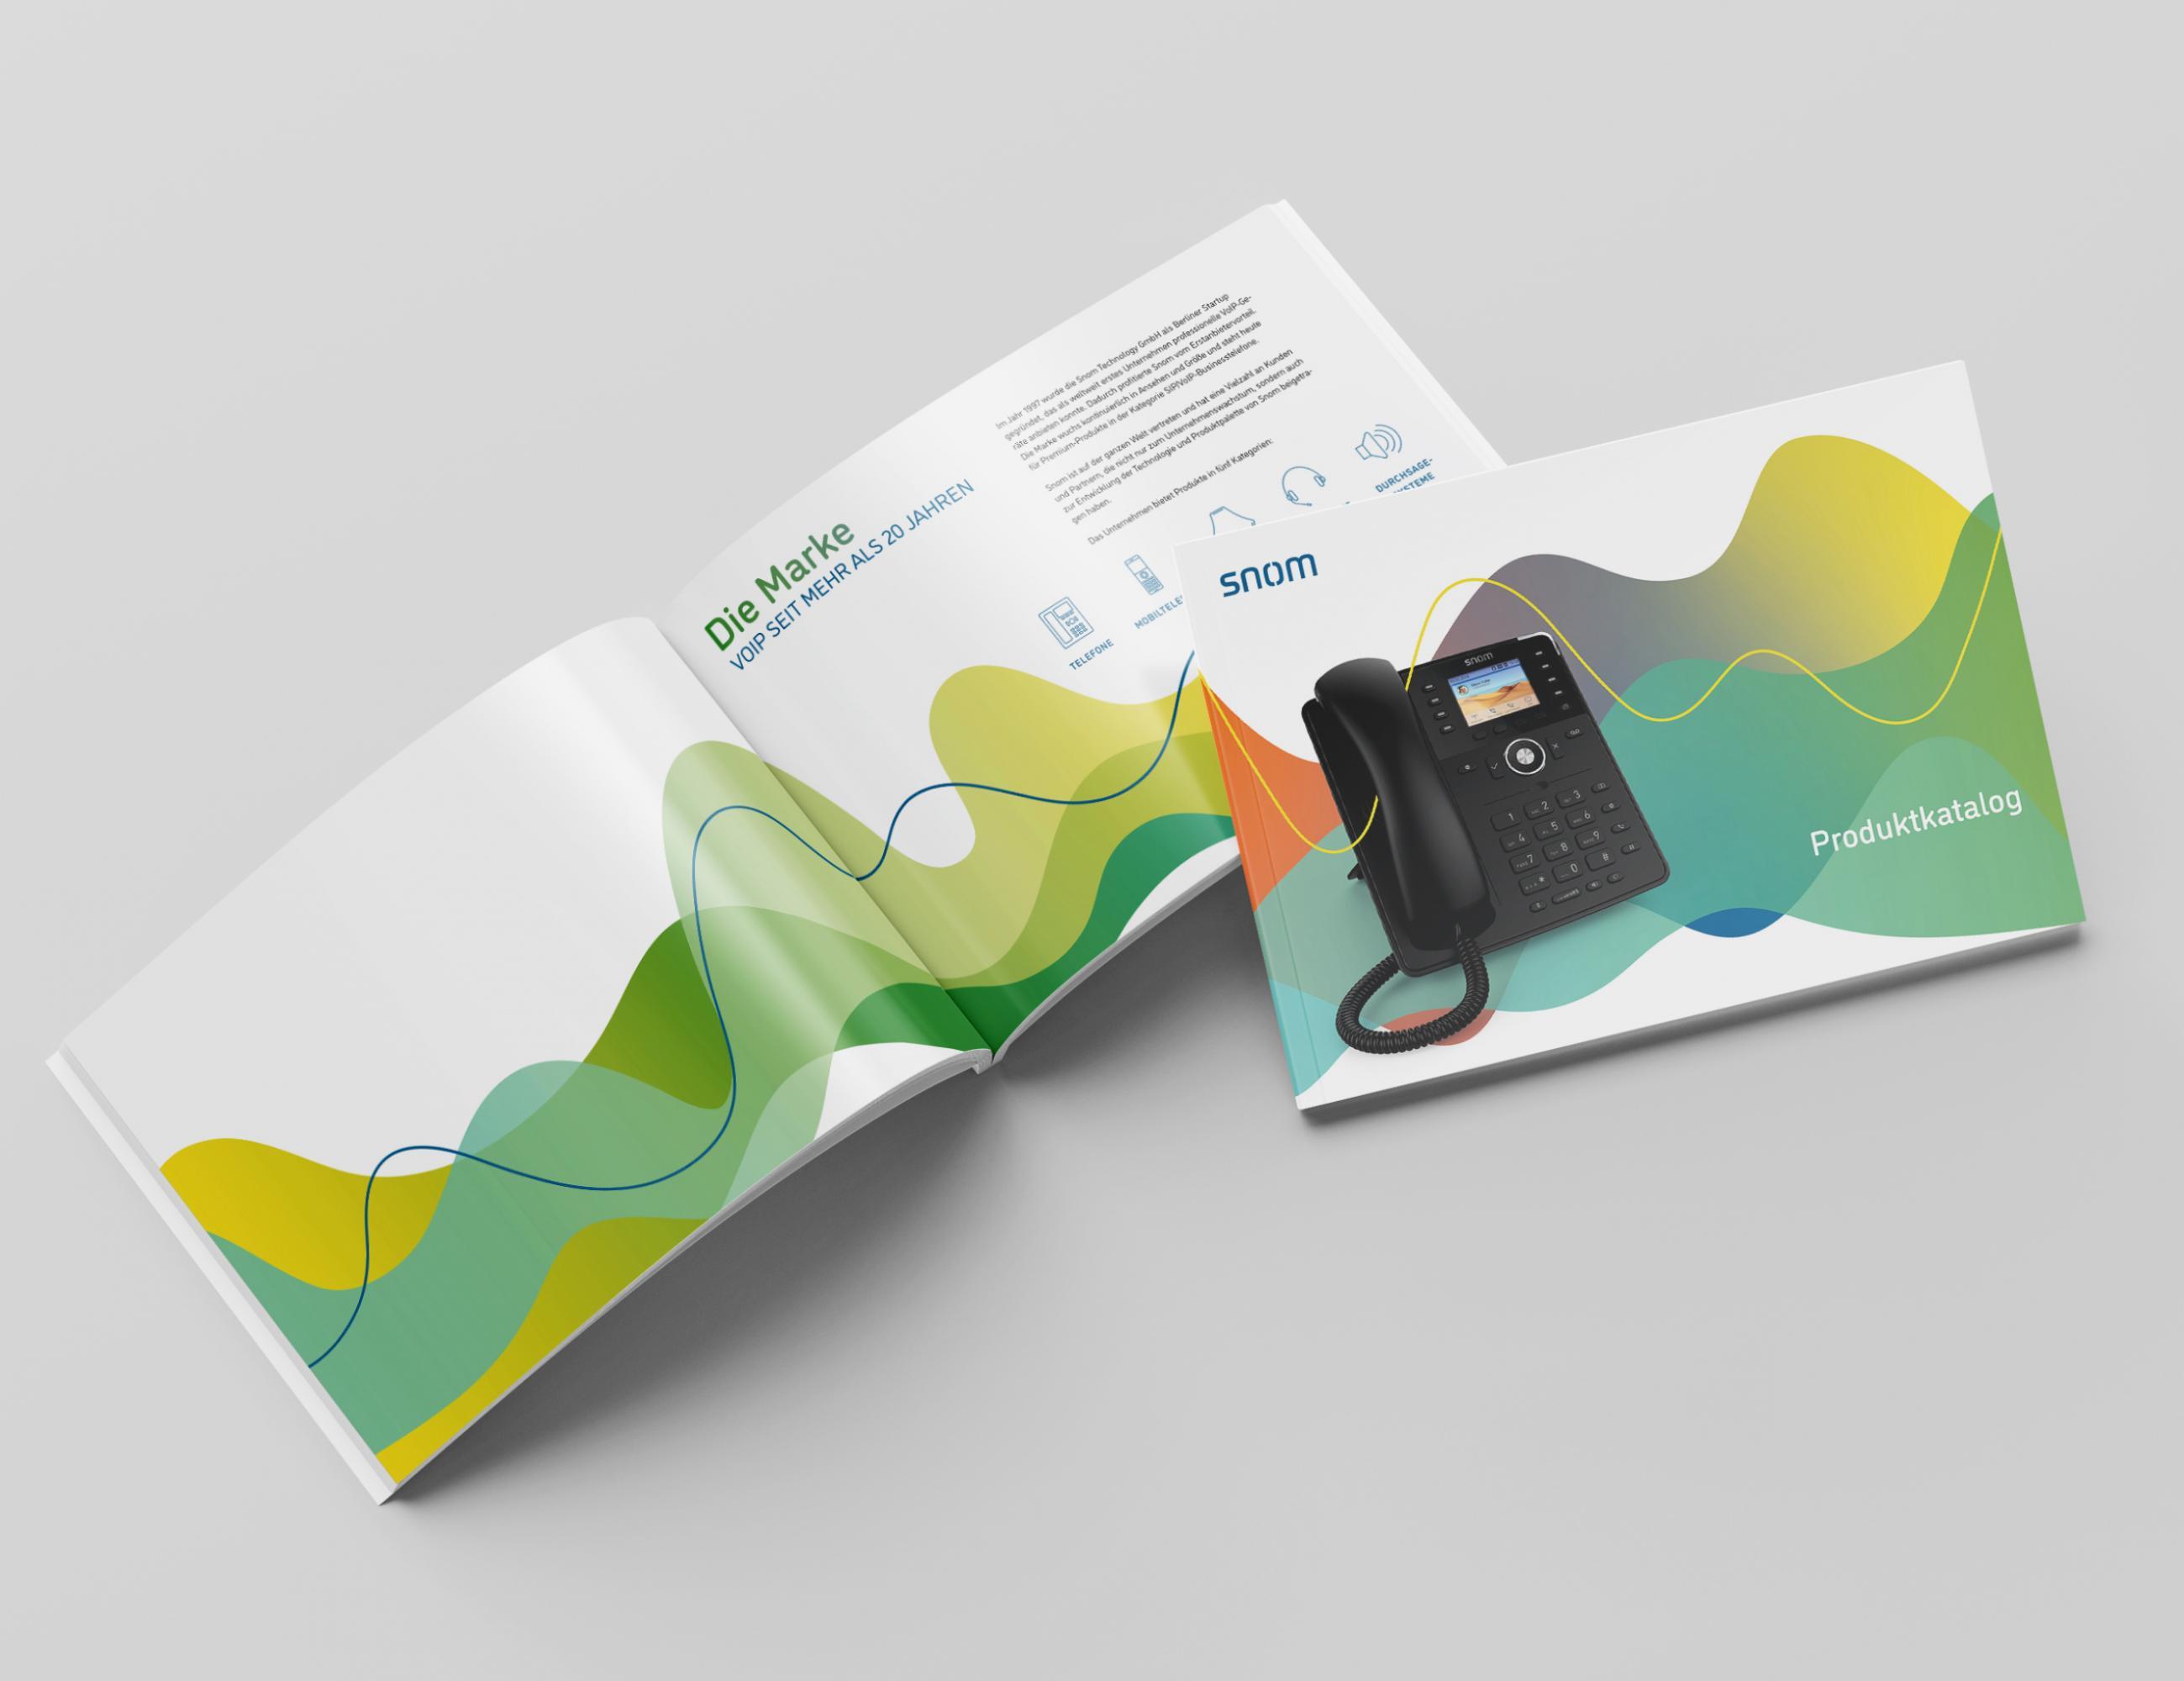 Snom-Brand-Redesign-FORMLOS-Berlin-ReBranding-Anwendung